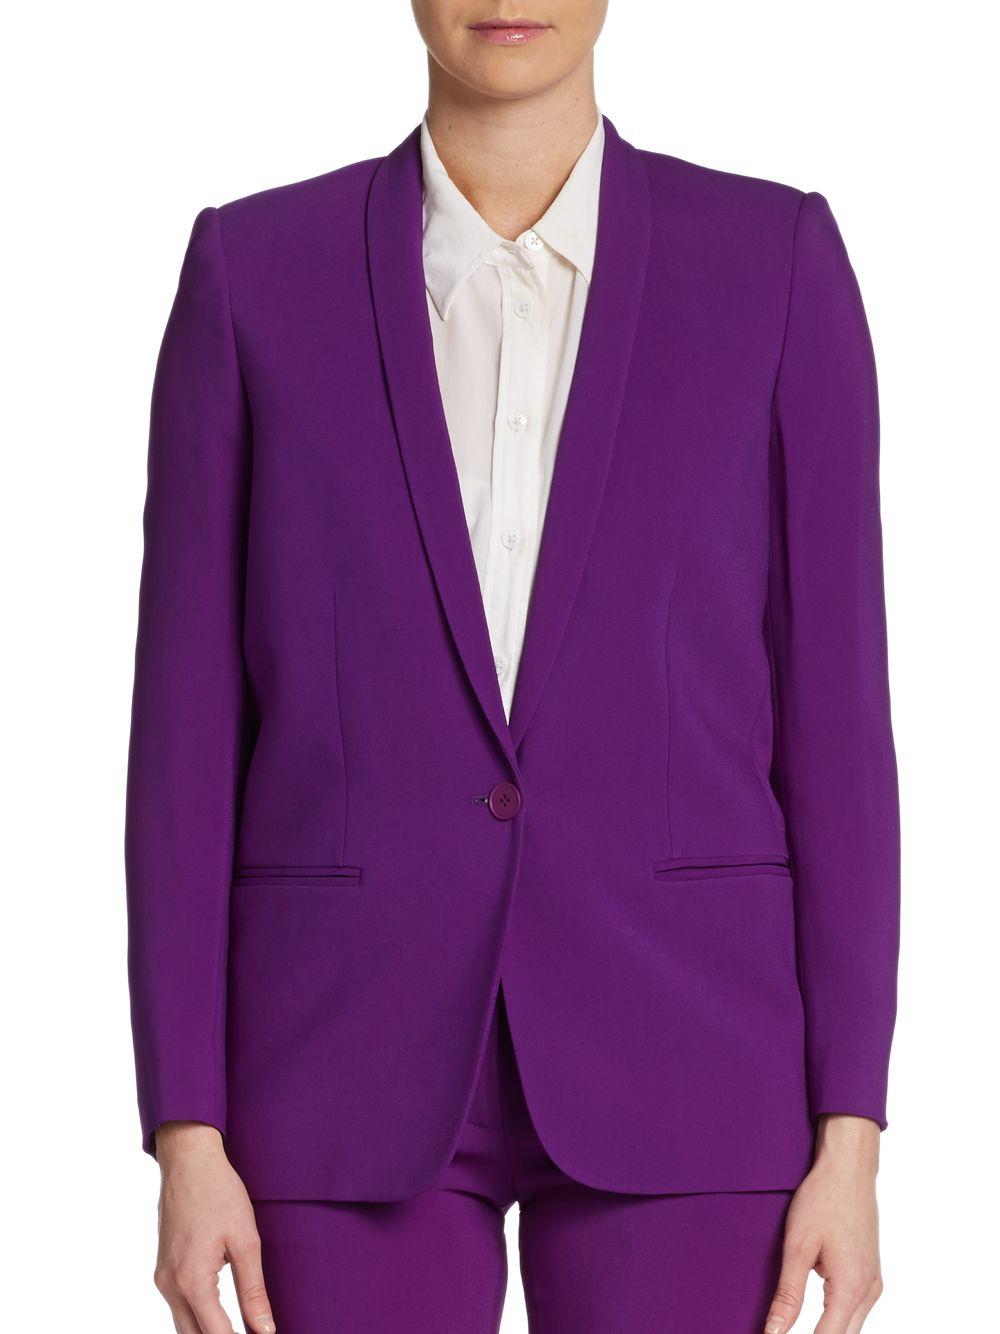 Stella mccartney Shawl Collar Suit Jacket in Purple